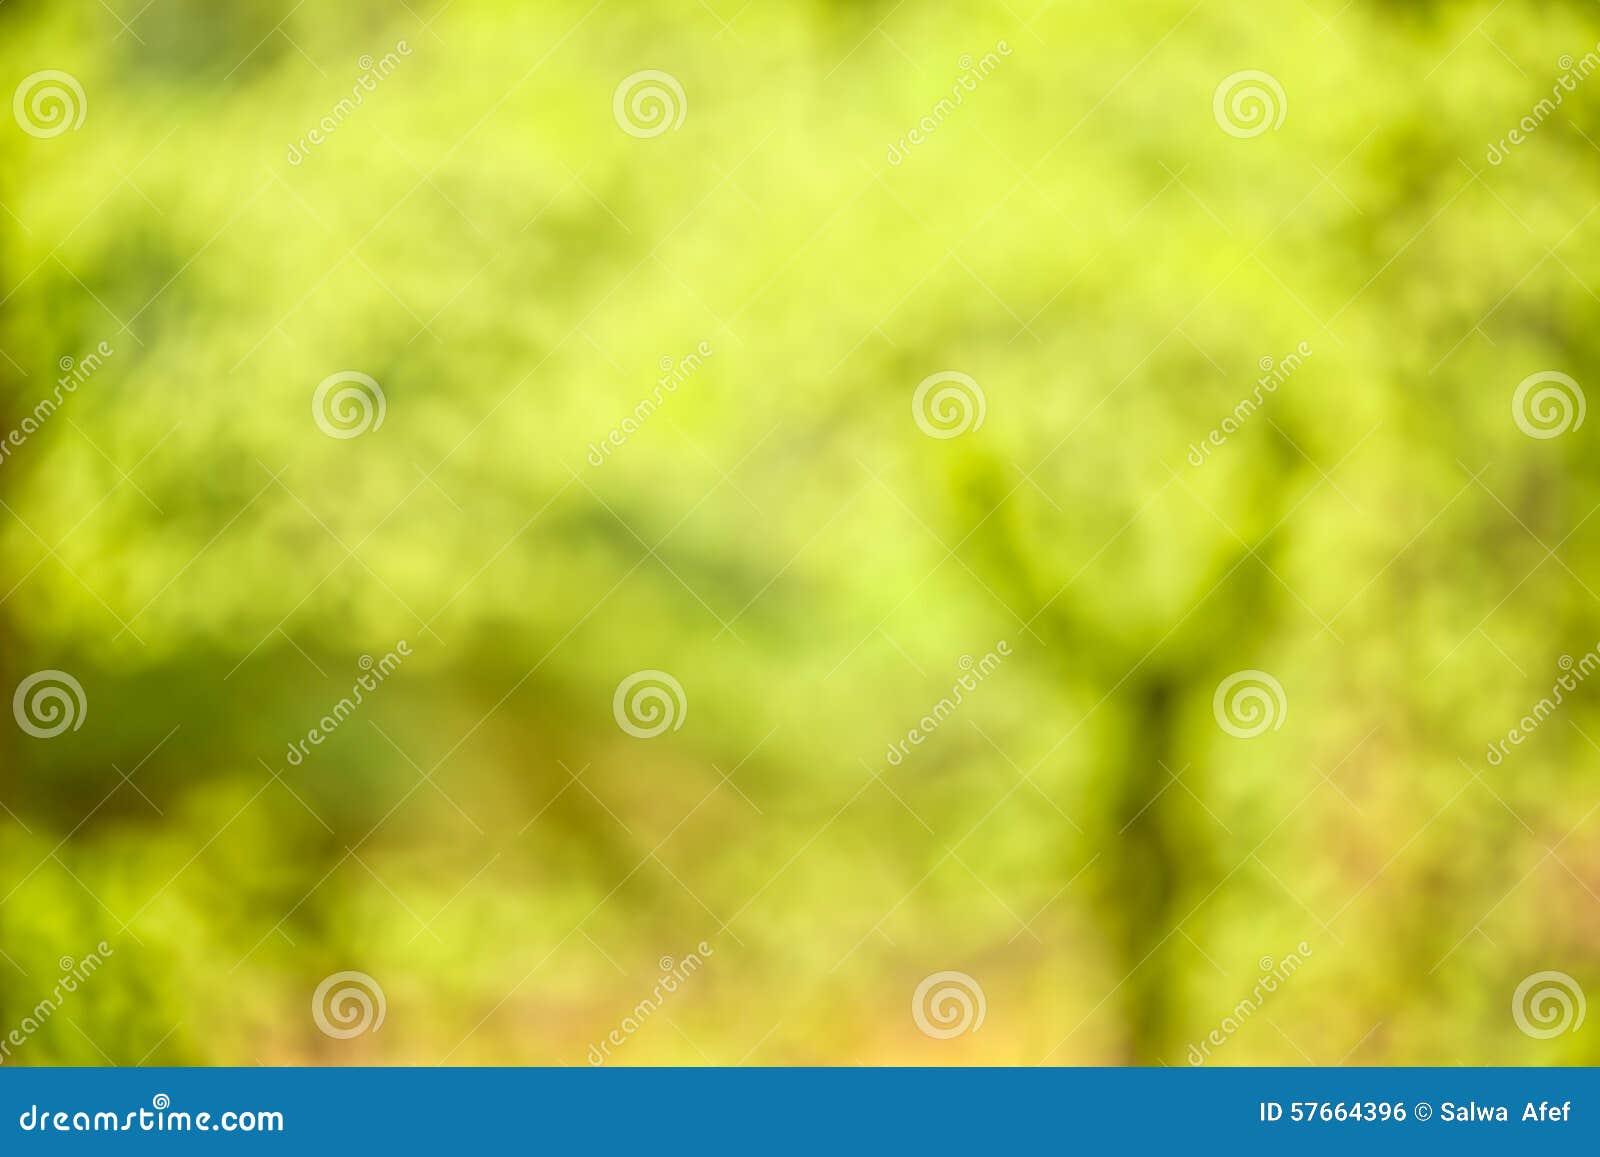 Конспект дерева